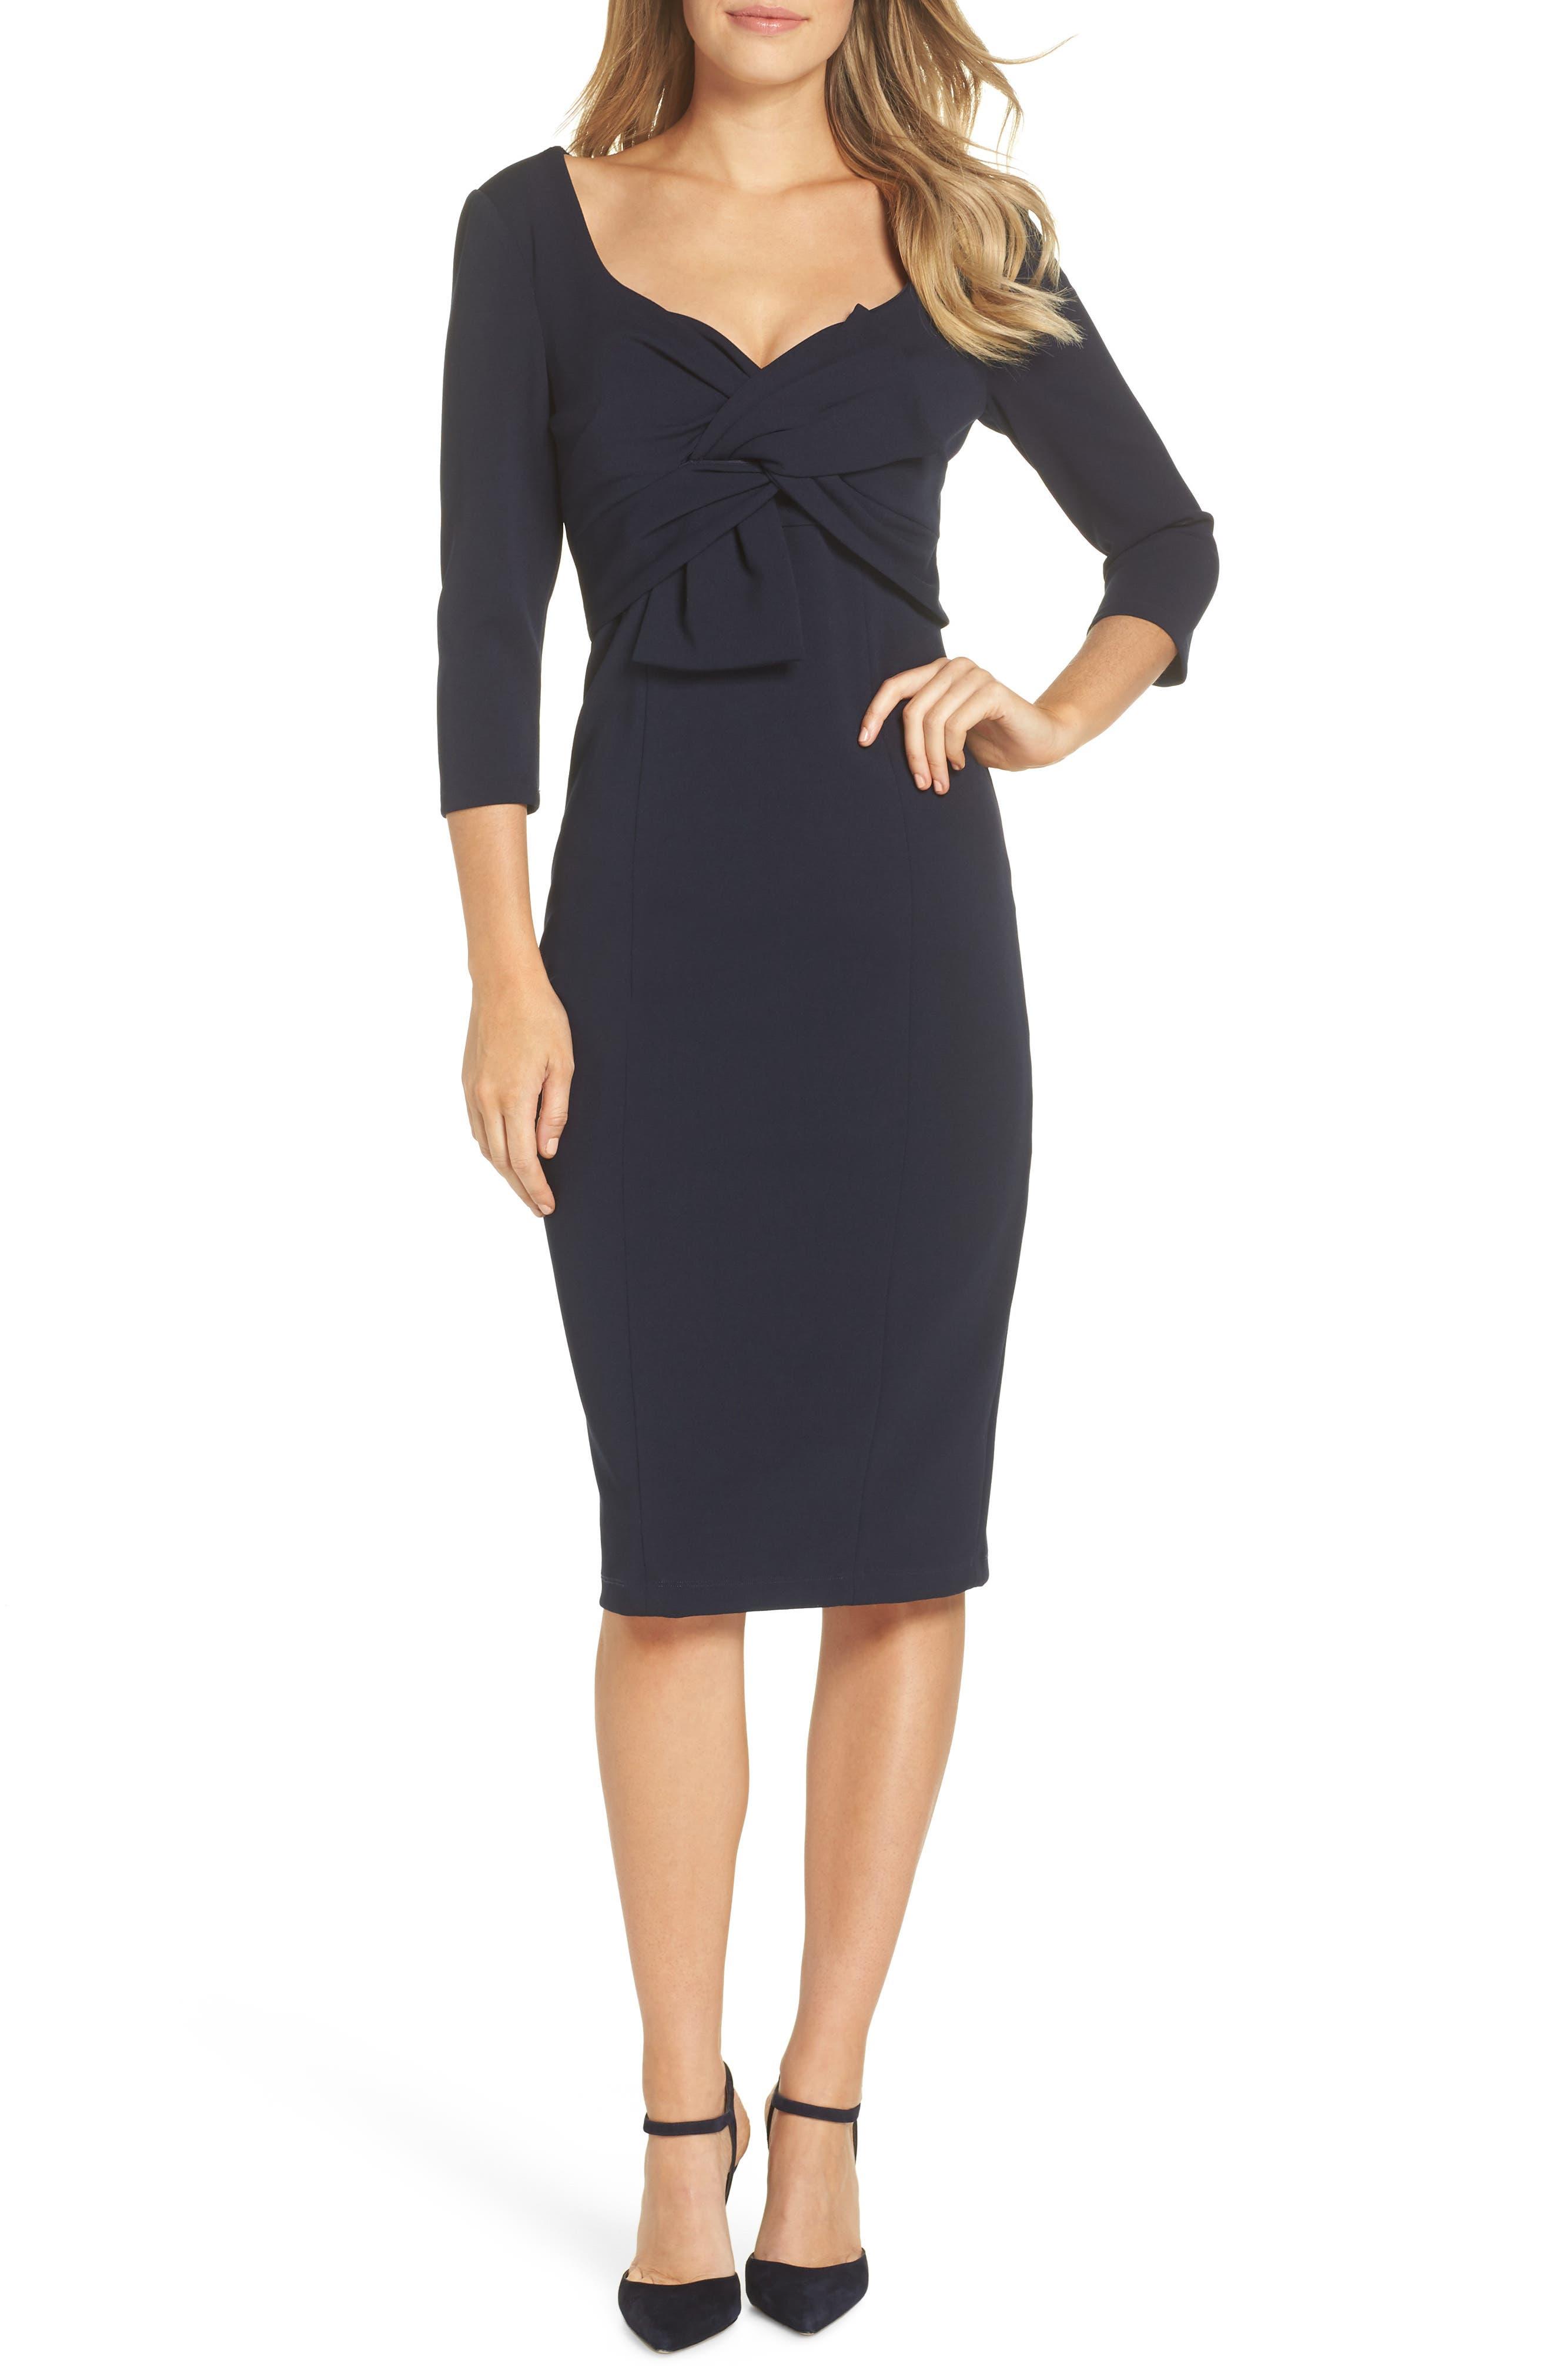 MAGGY LONDON Bow Twist Scuba Crepe Dress, Main, color, TWILIGHT NAVY